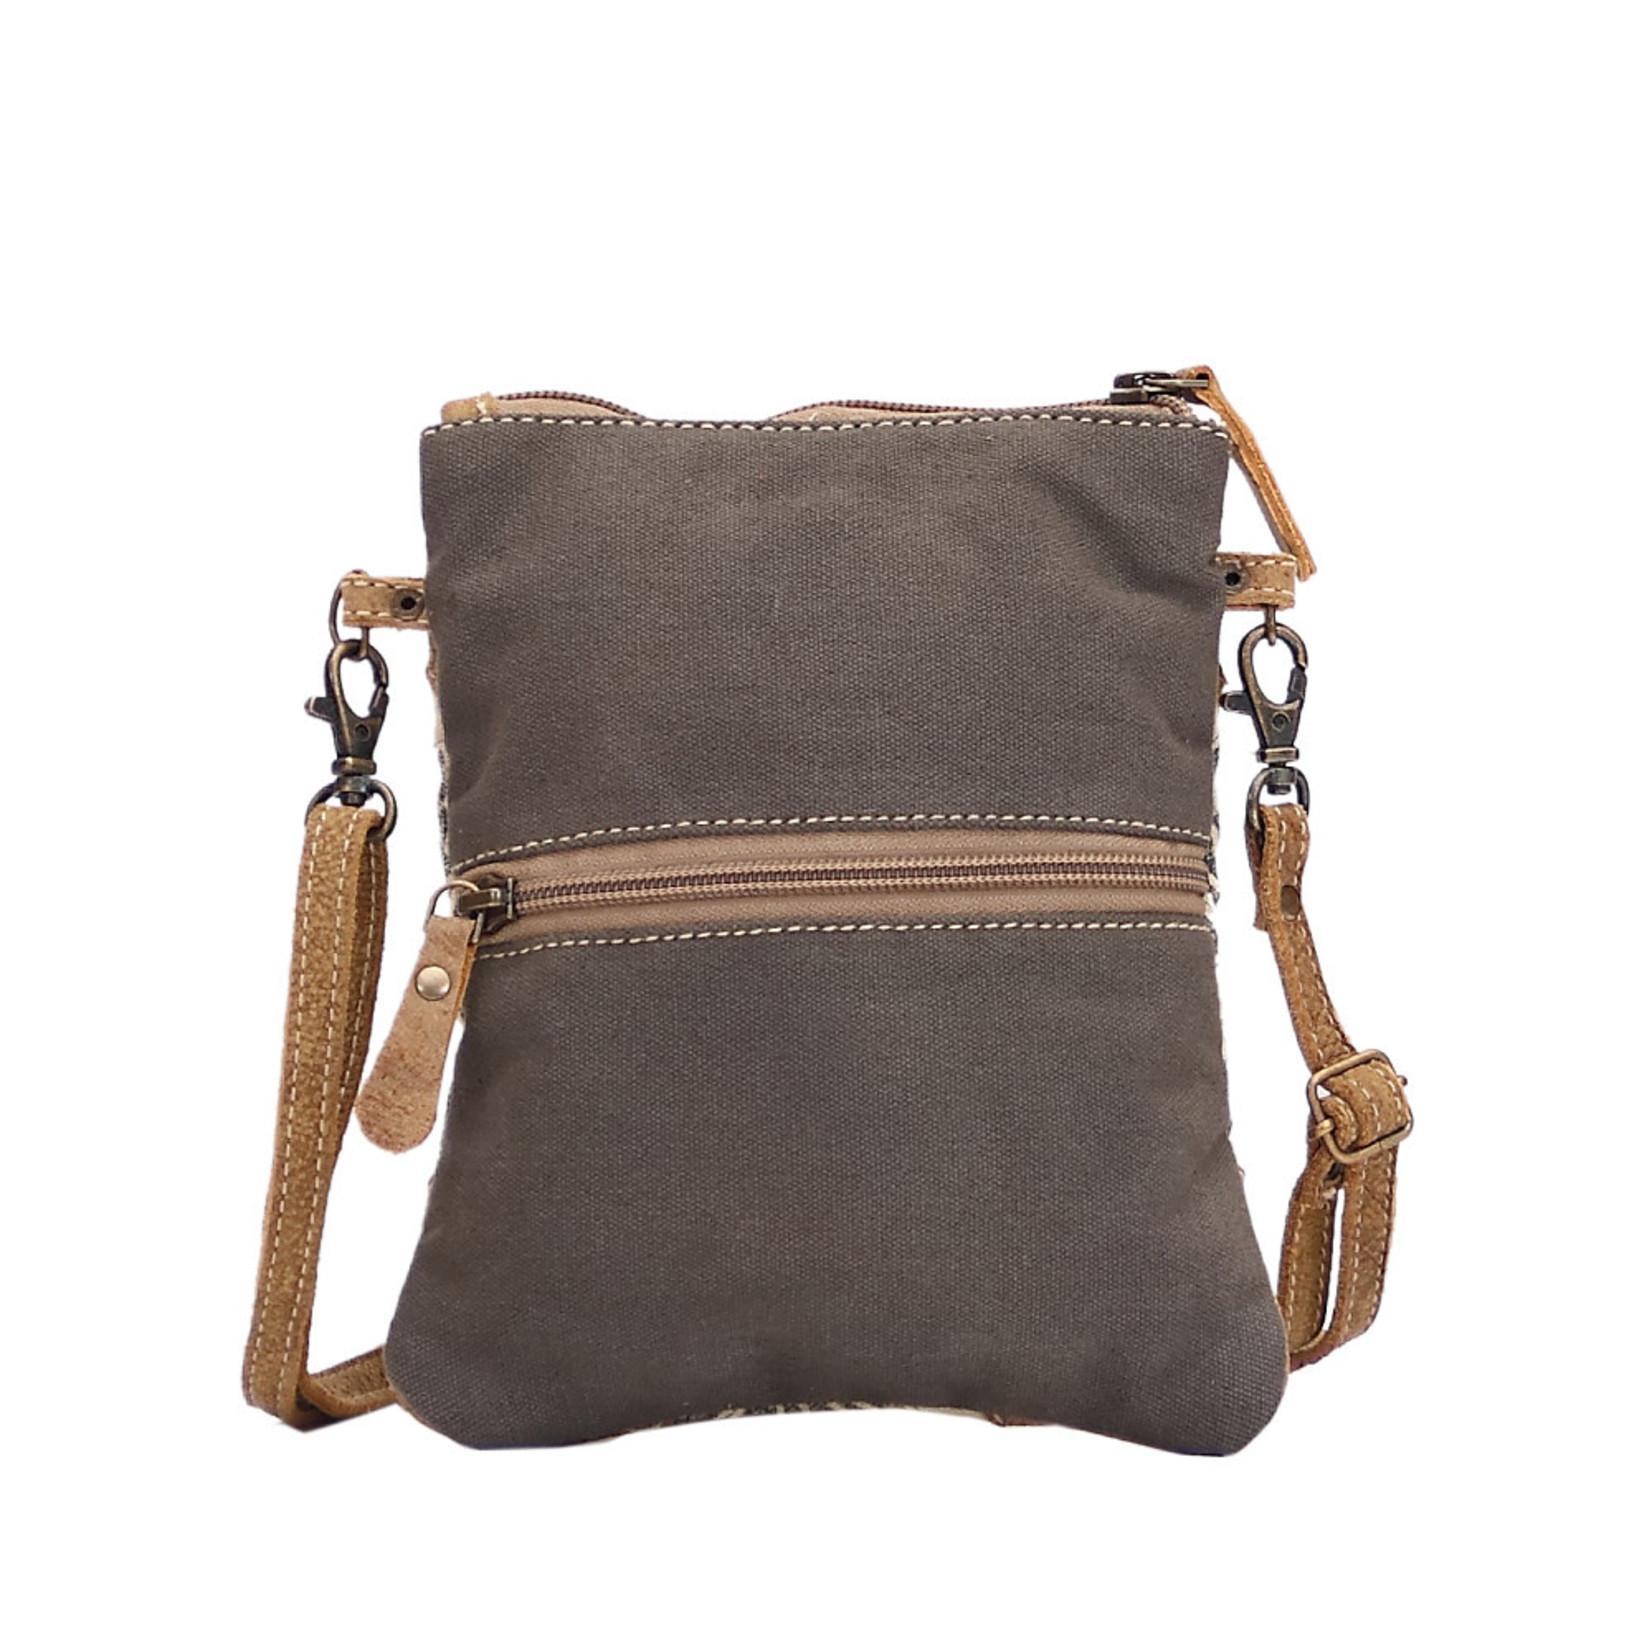 Myra Bags S-1511 Flare Small Crossbody Bag